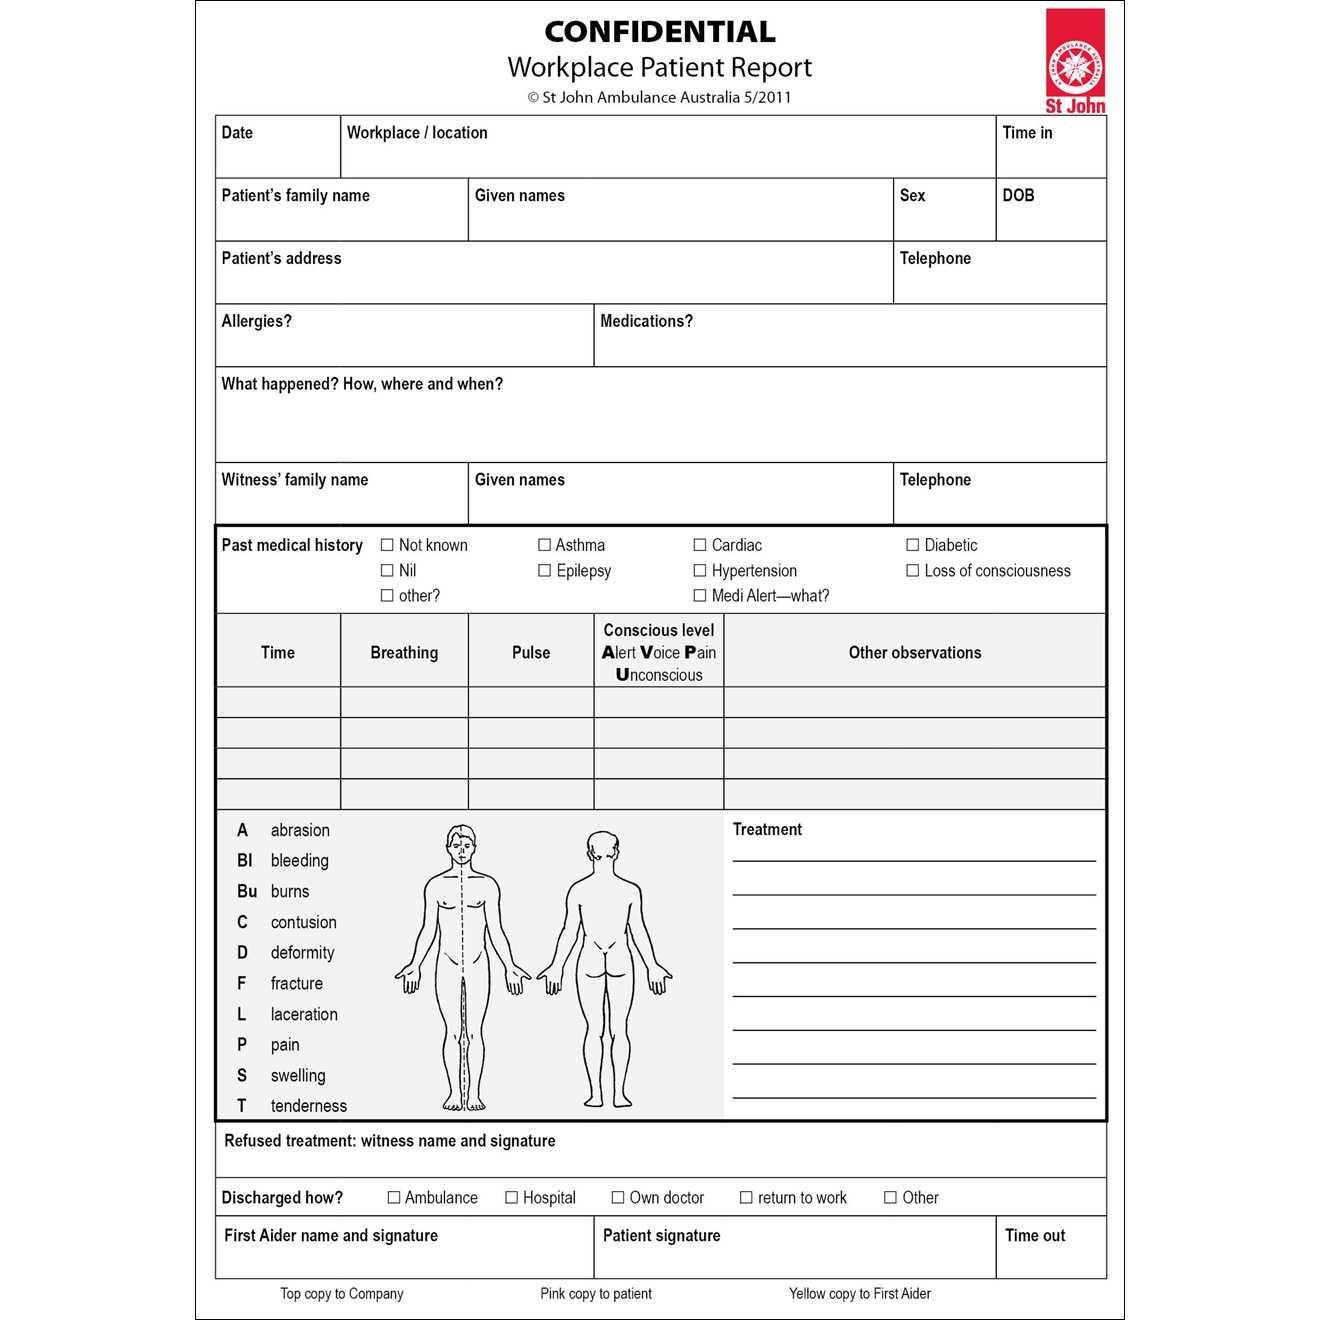 First Aid Incident Report Template - Karan.ald2014 Intended For First Aid Incident Report Form Template